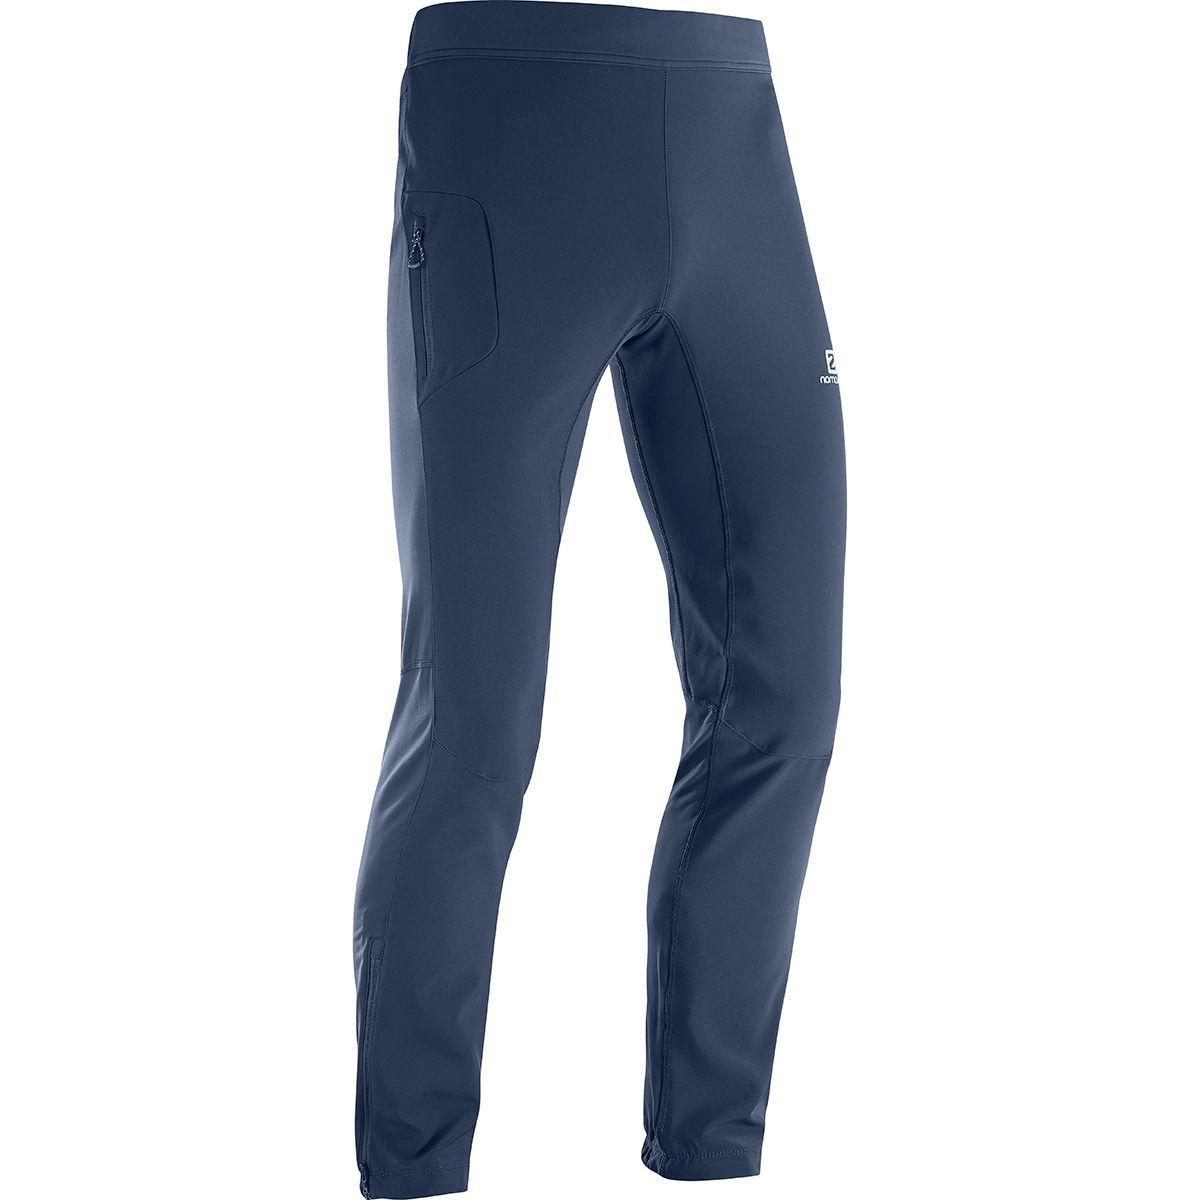 Salomon RS Warm Softshell Pant - Men's